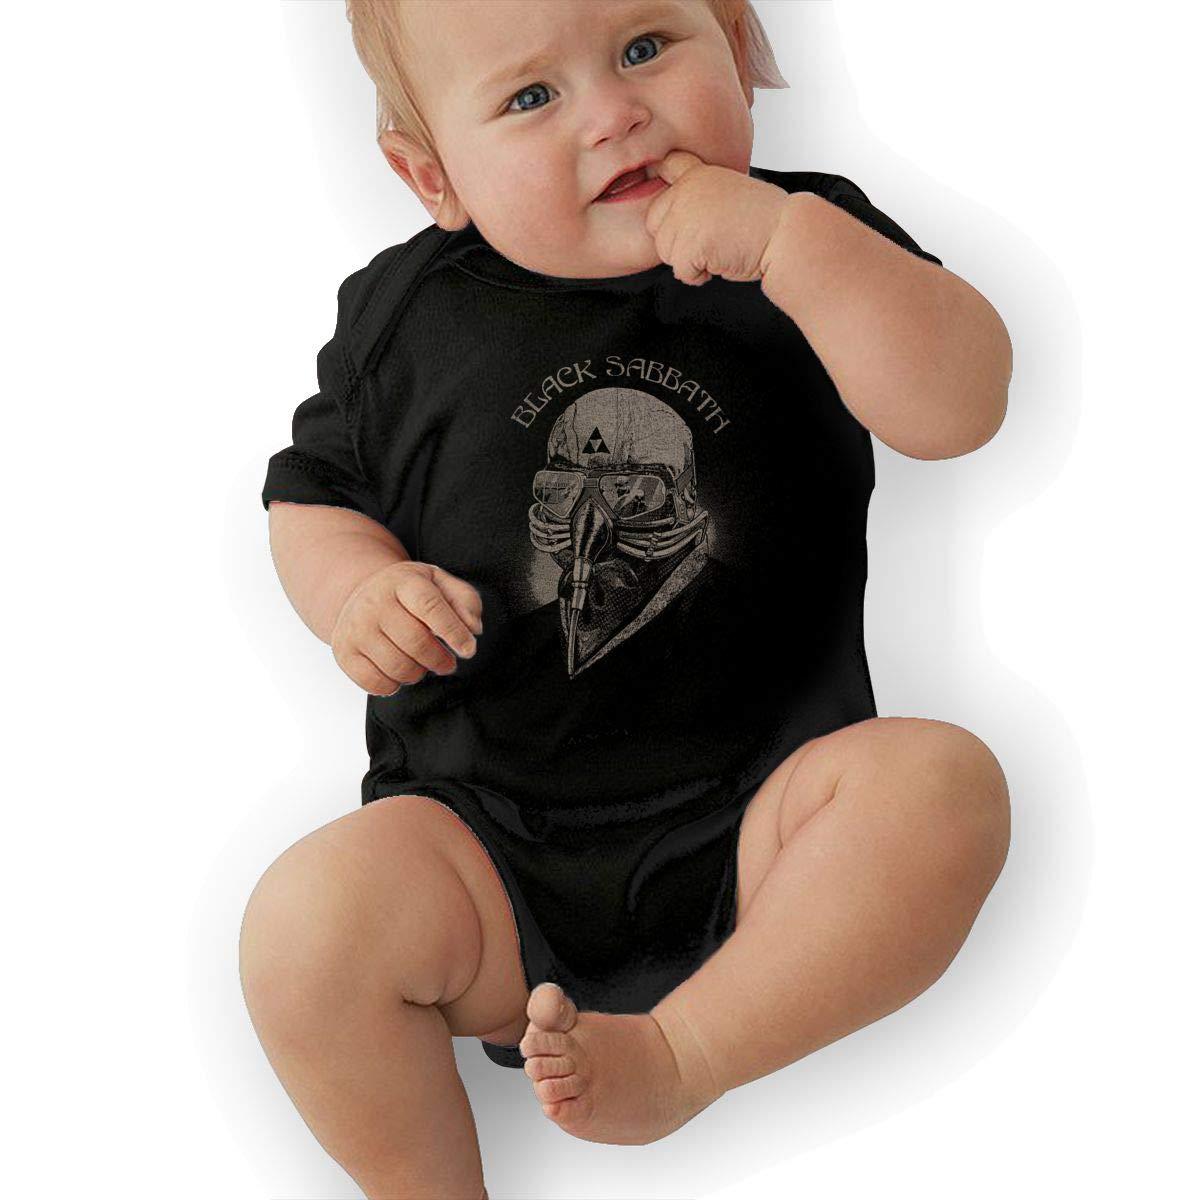 LuckyTagy Black Sabbath Unisex Vintage Boys /& Girls Romper Baby GirlBodysuit Black